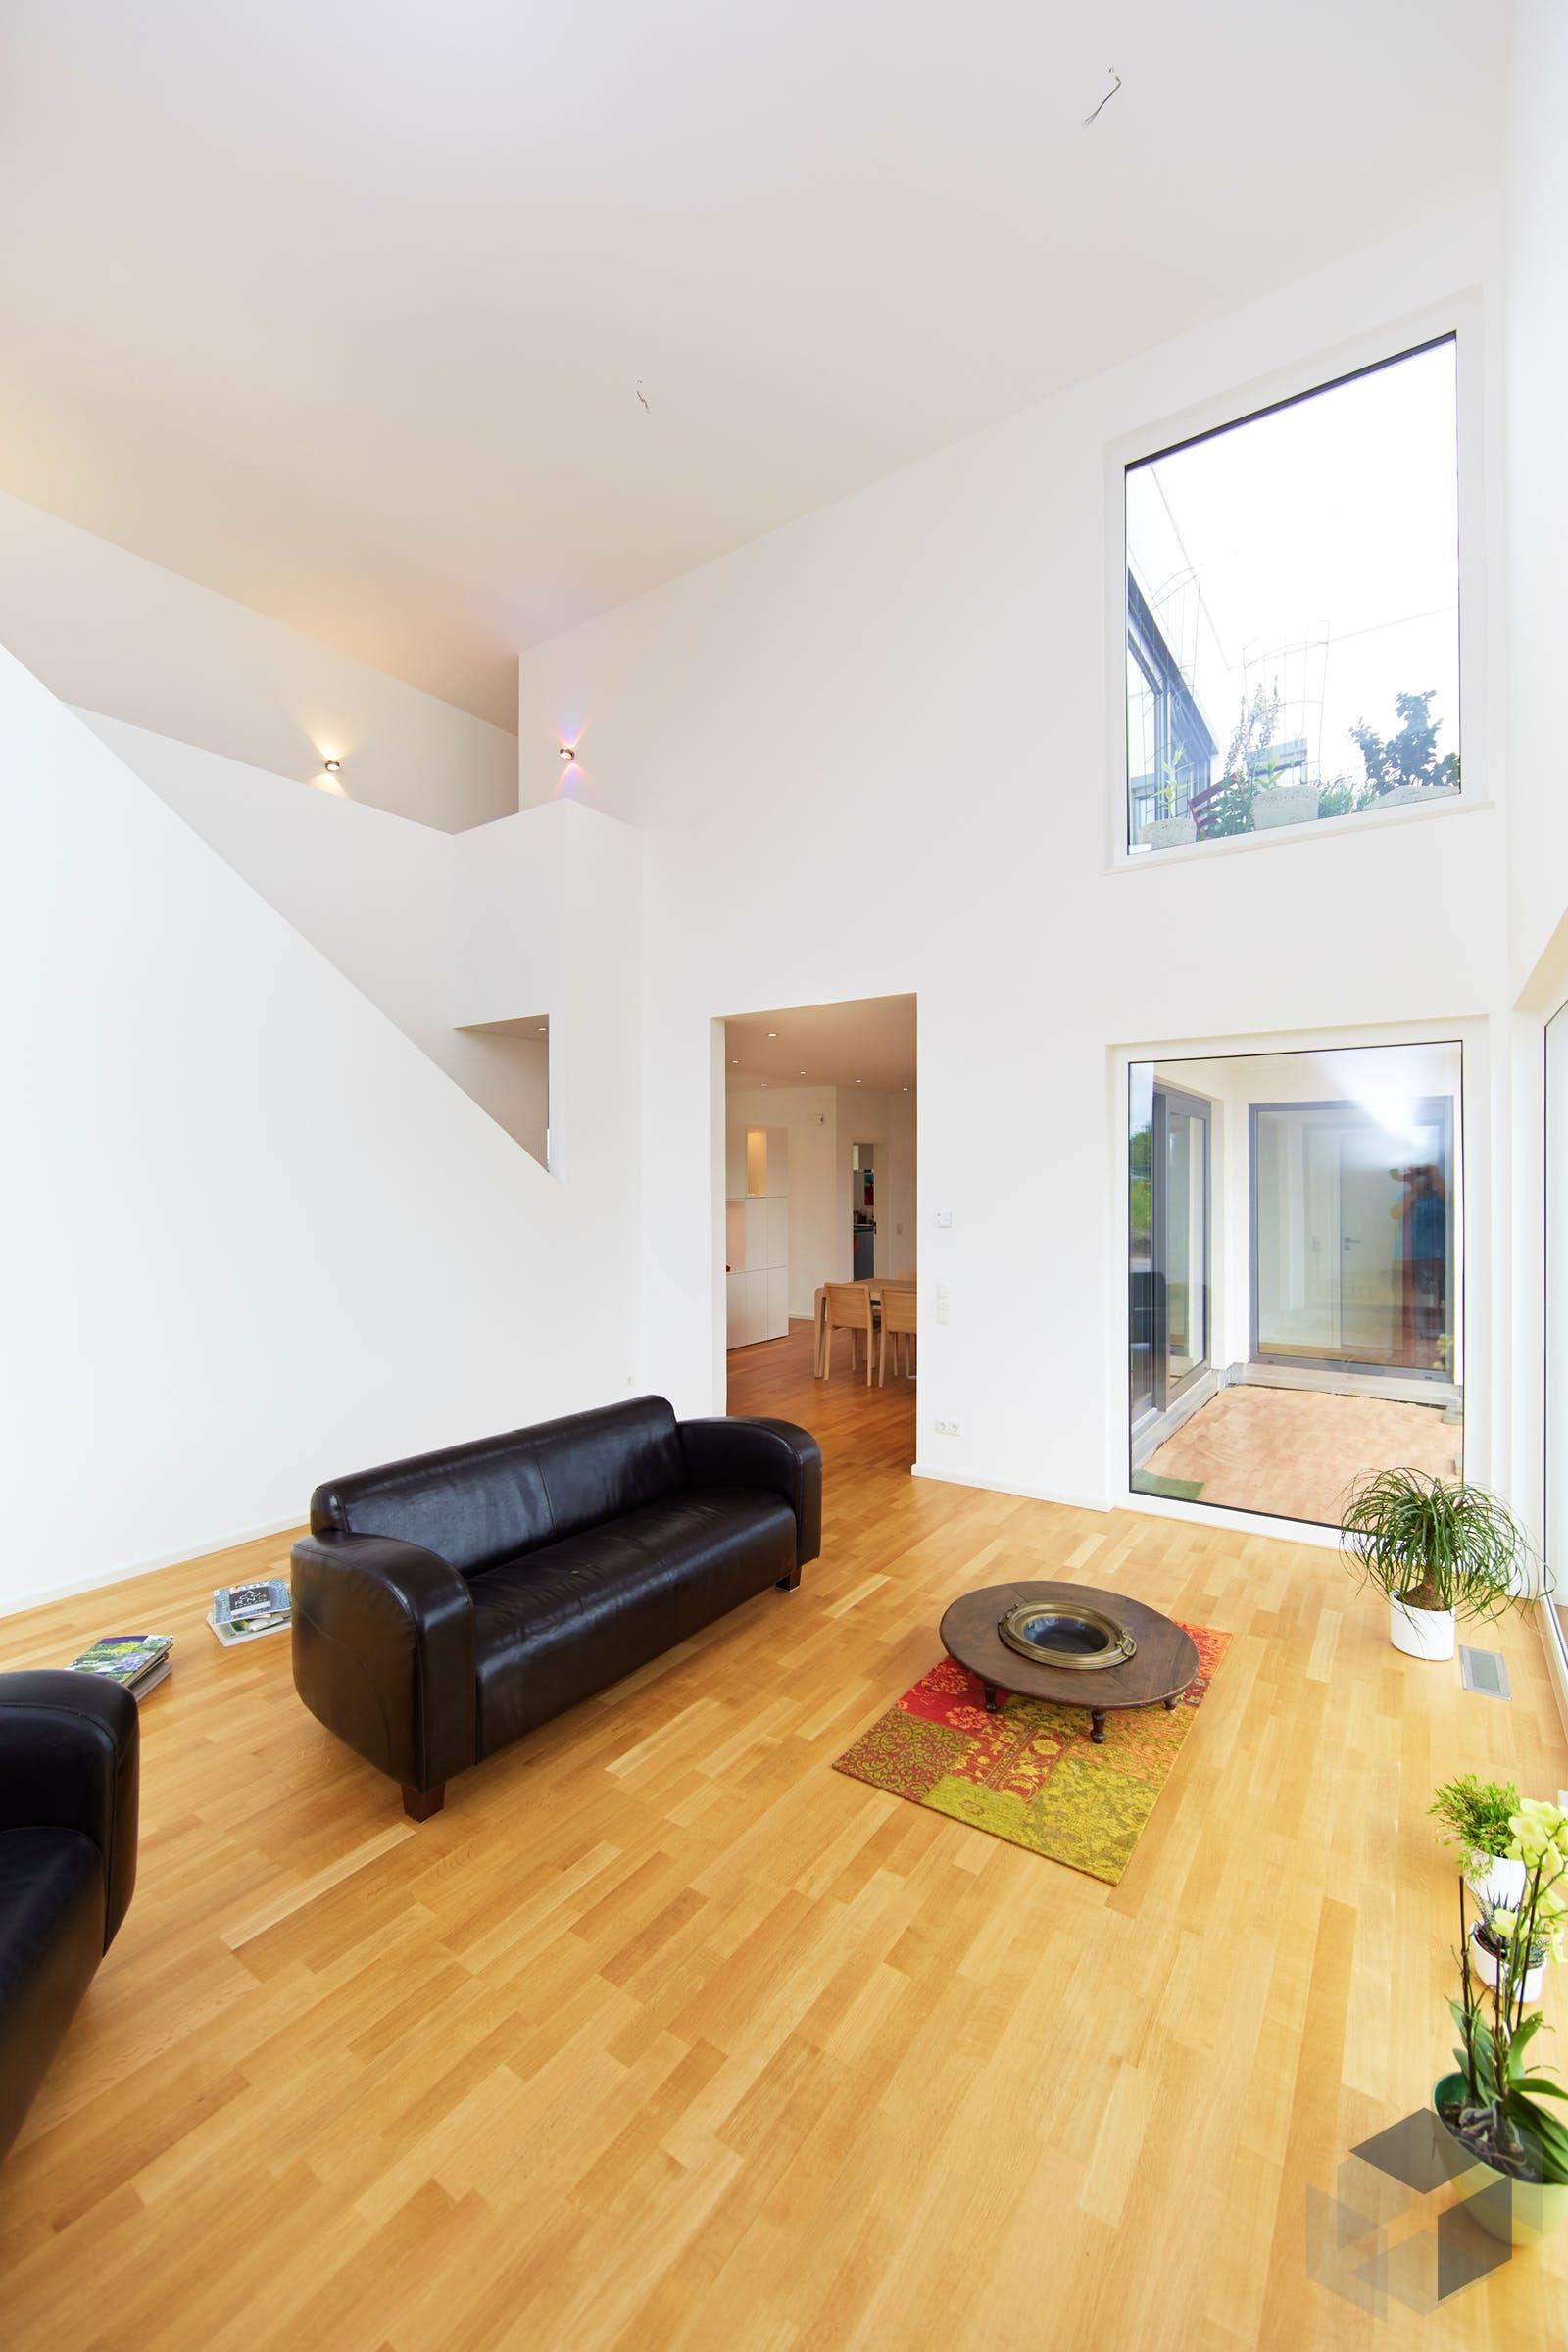 bauhausvilla cubus inactive von haacke haus. Black Bedroom Furniture Sets. Home Design Ideas